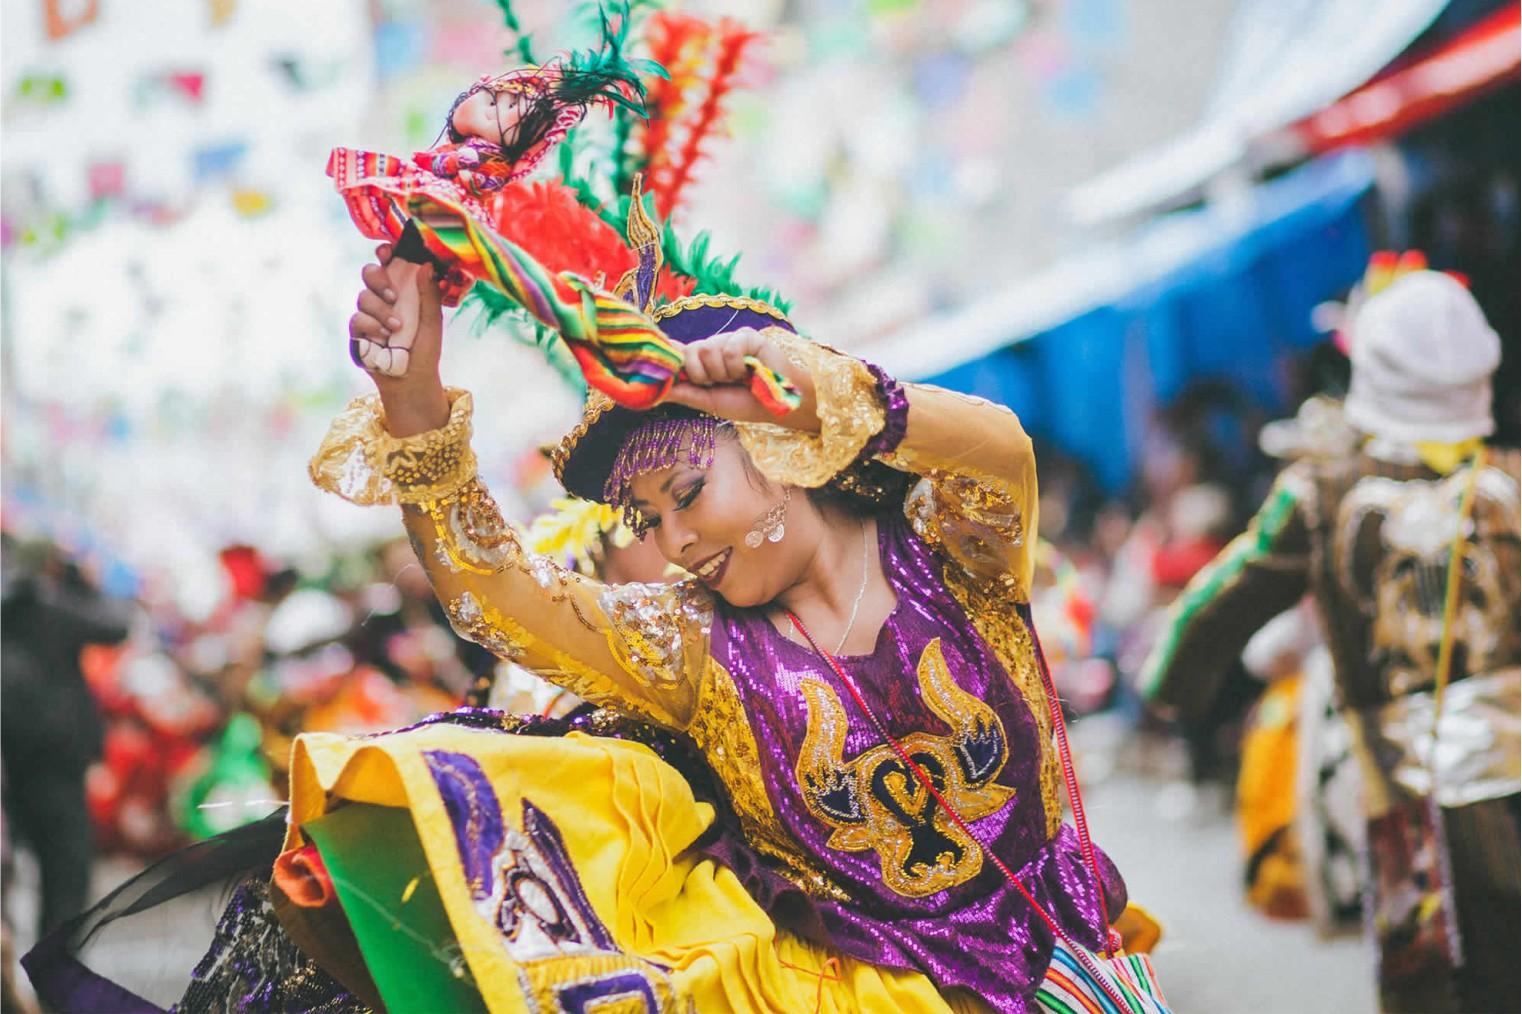 Carnaval in Oruro. Travel. Карнавал в Оруро